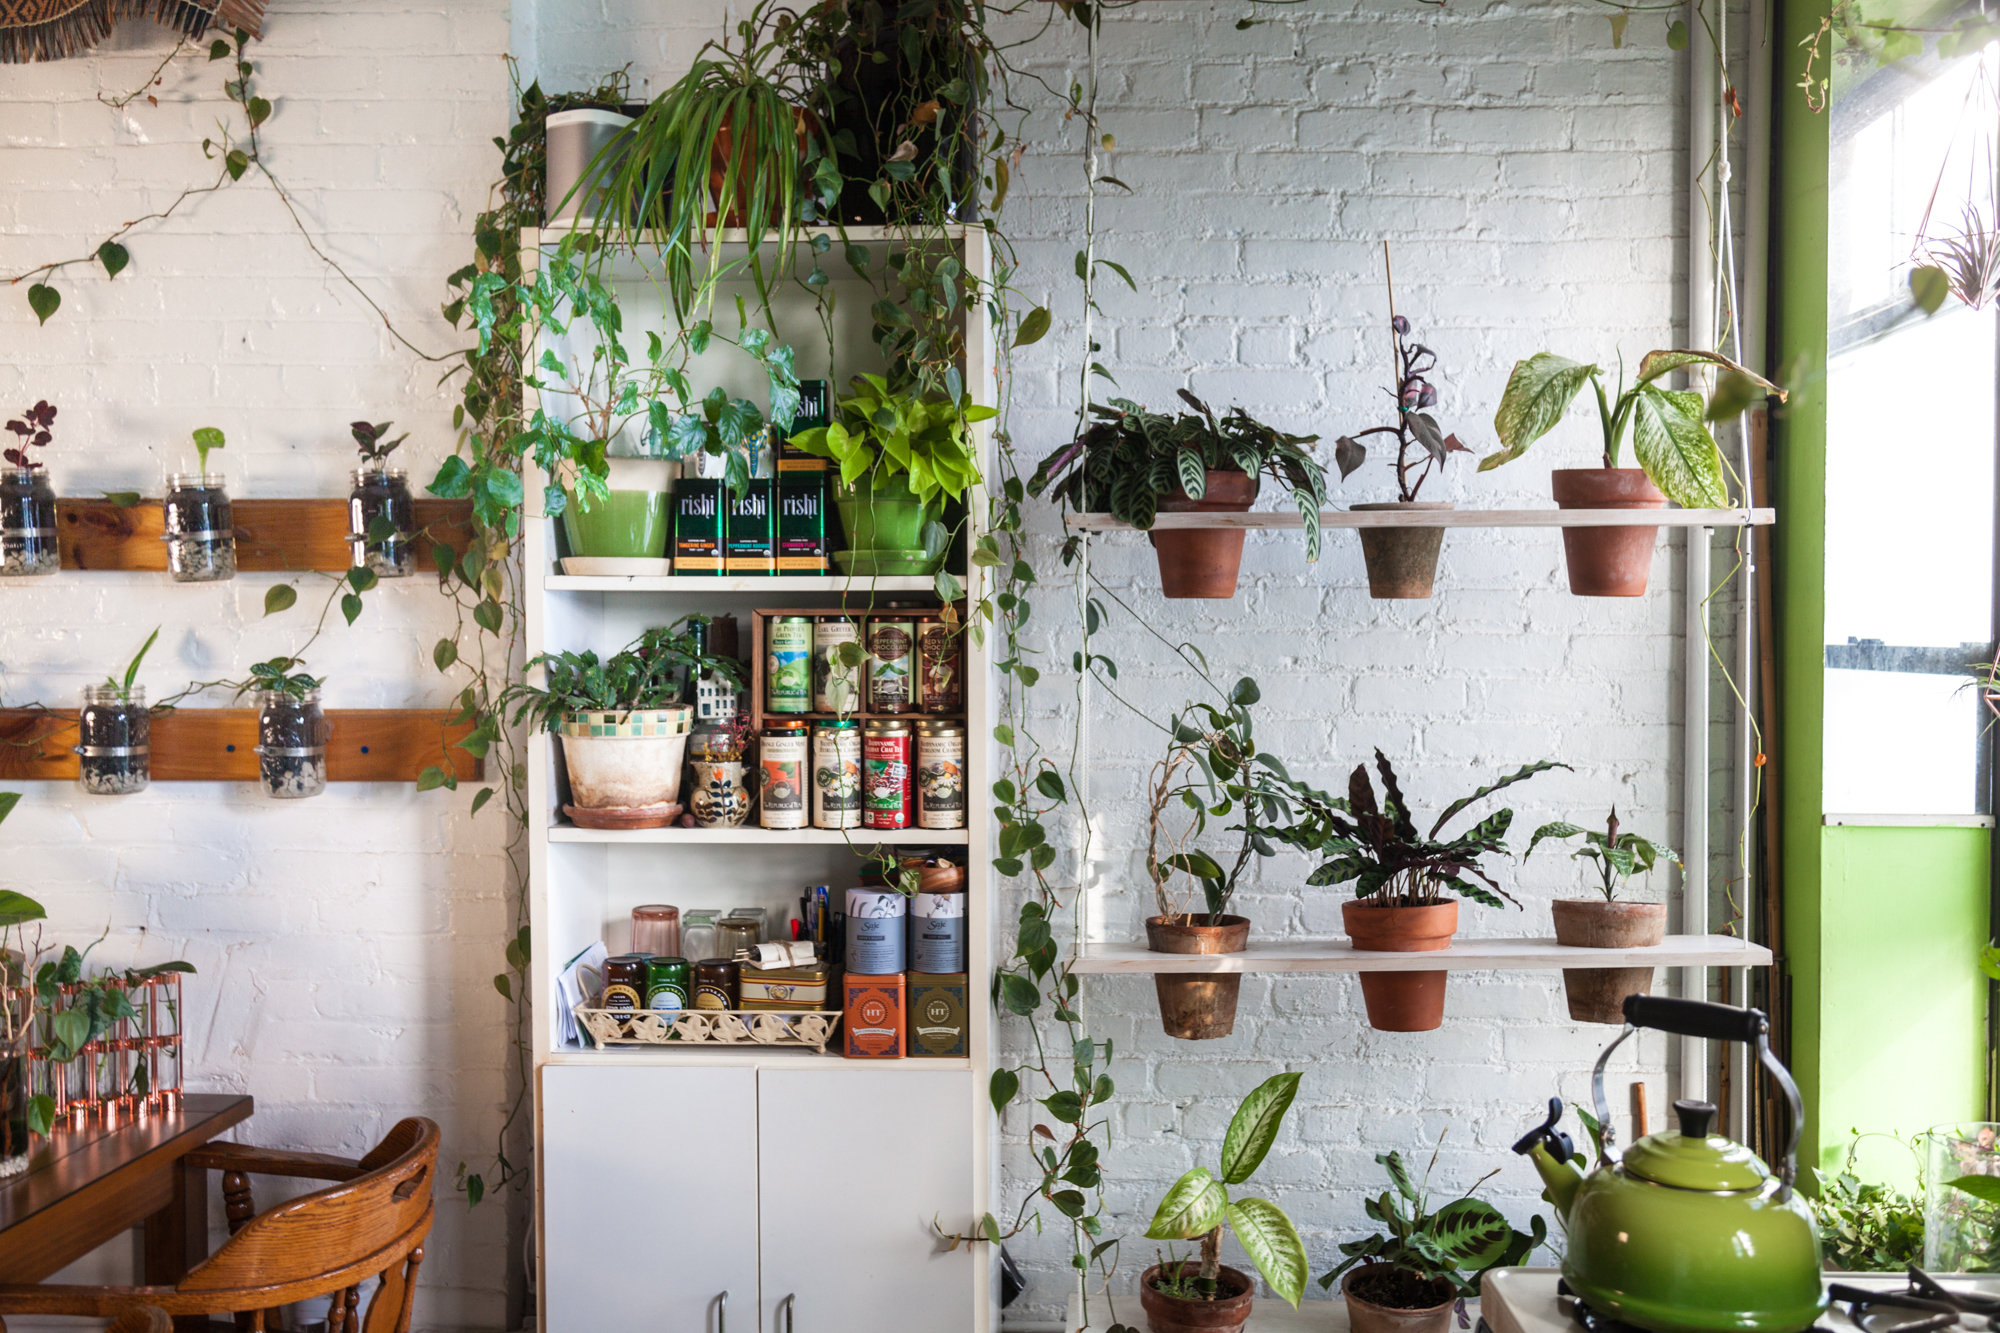 2017-May-8-Plants-SELECTS-9526.jpg